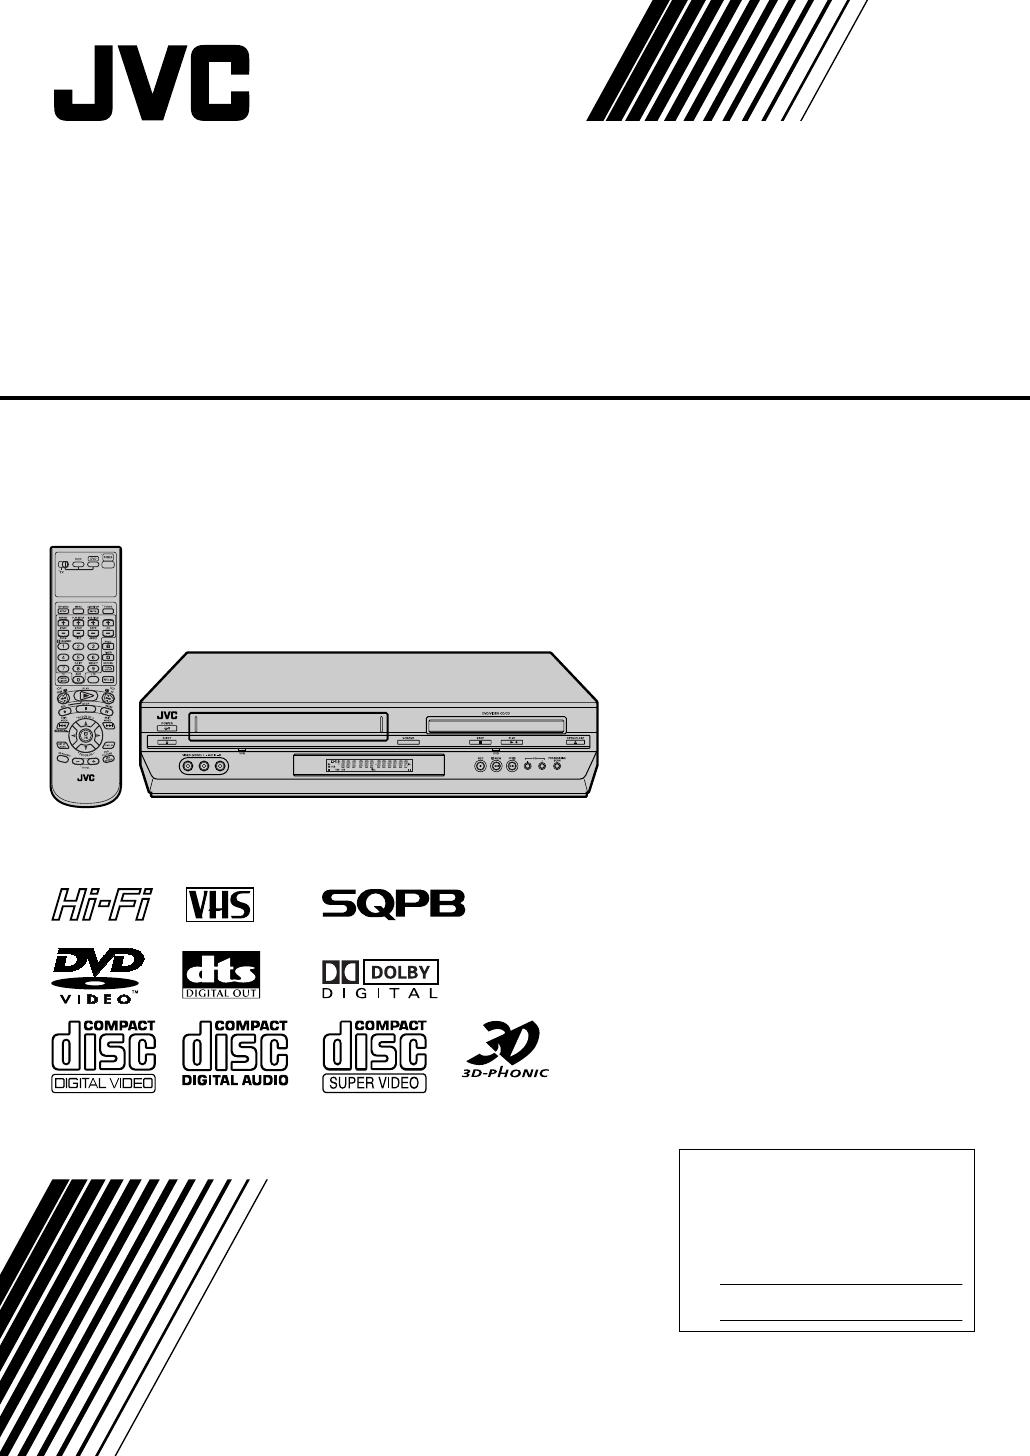 JVC HR-XVC33U manual